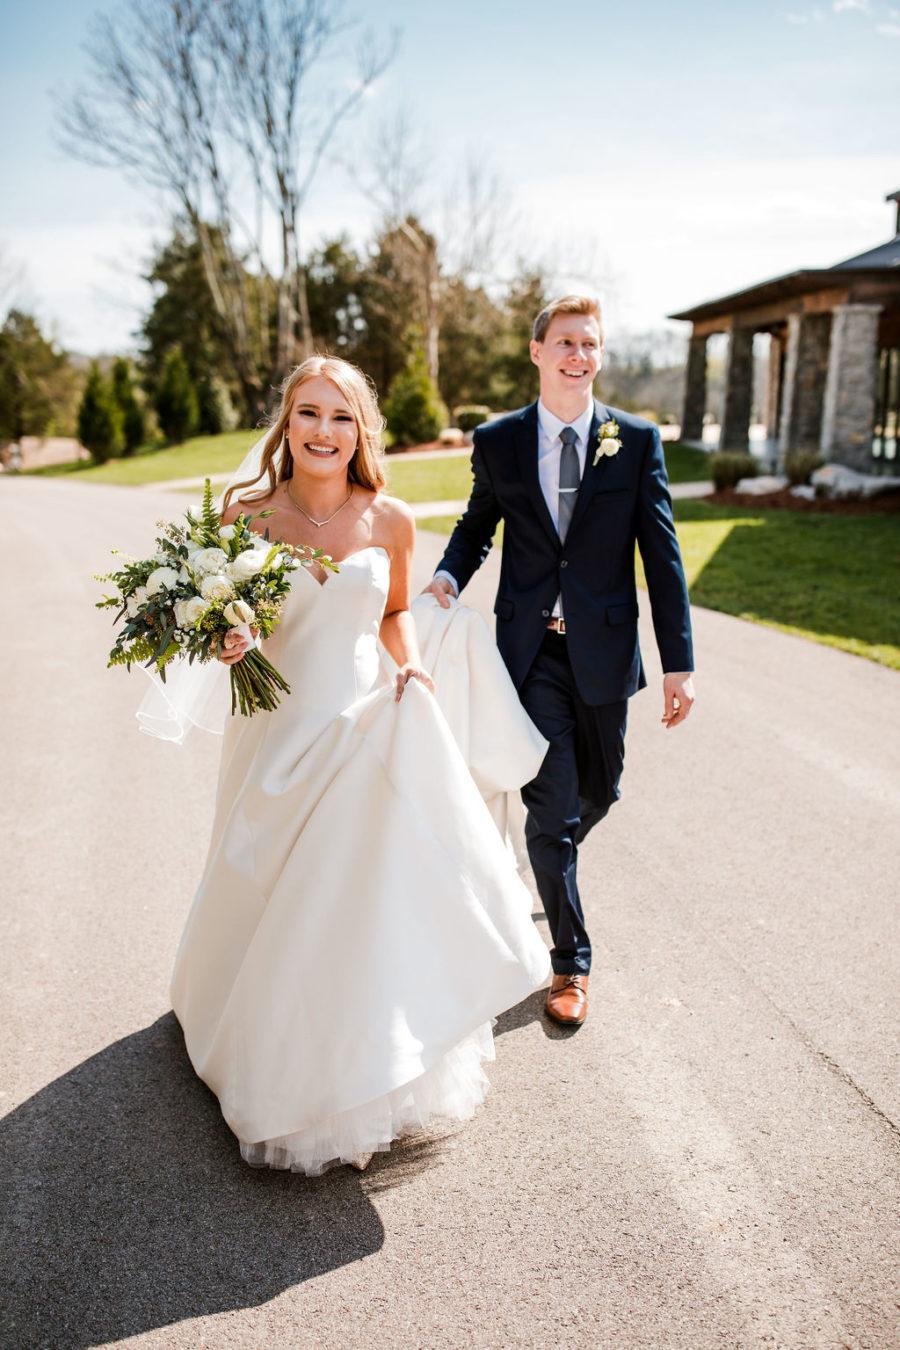 Nashville Wedding Photographer: Beautiful Graystone Quarry Wedding captured by John Myers Photography & Videography